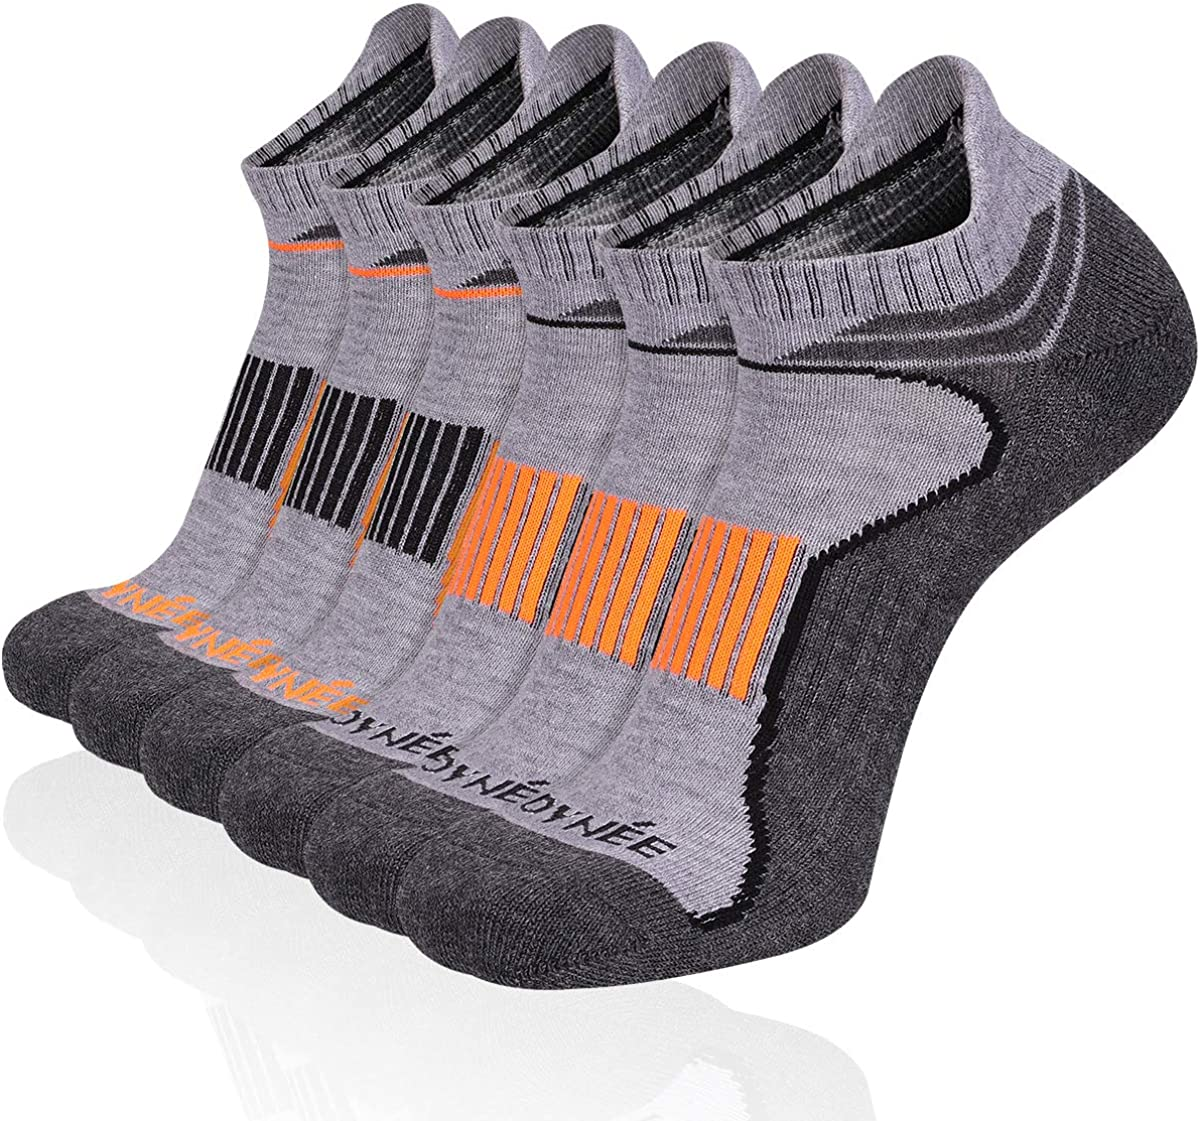 JOYNÉE 6 Pack Mens Ankle Socks Low Cut Athletic Cushioned Running Tab Socks